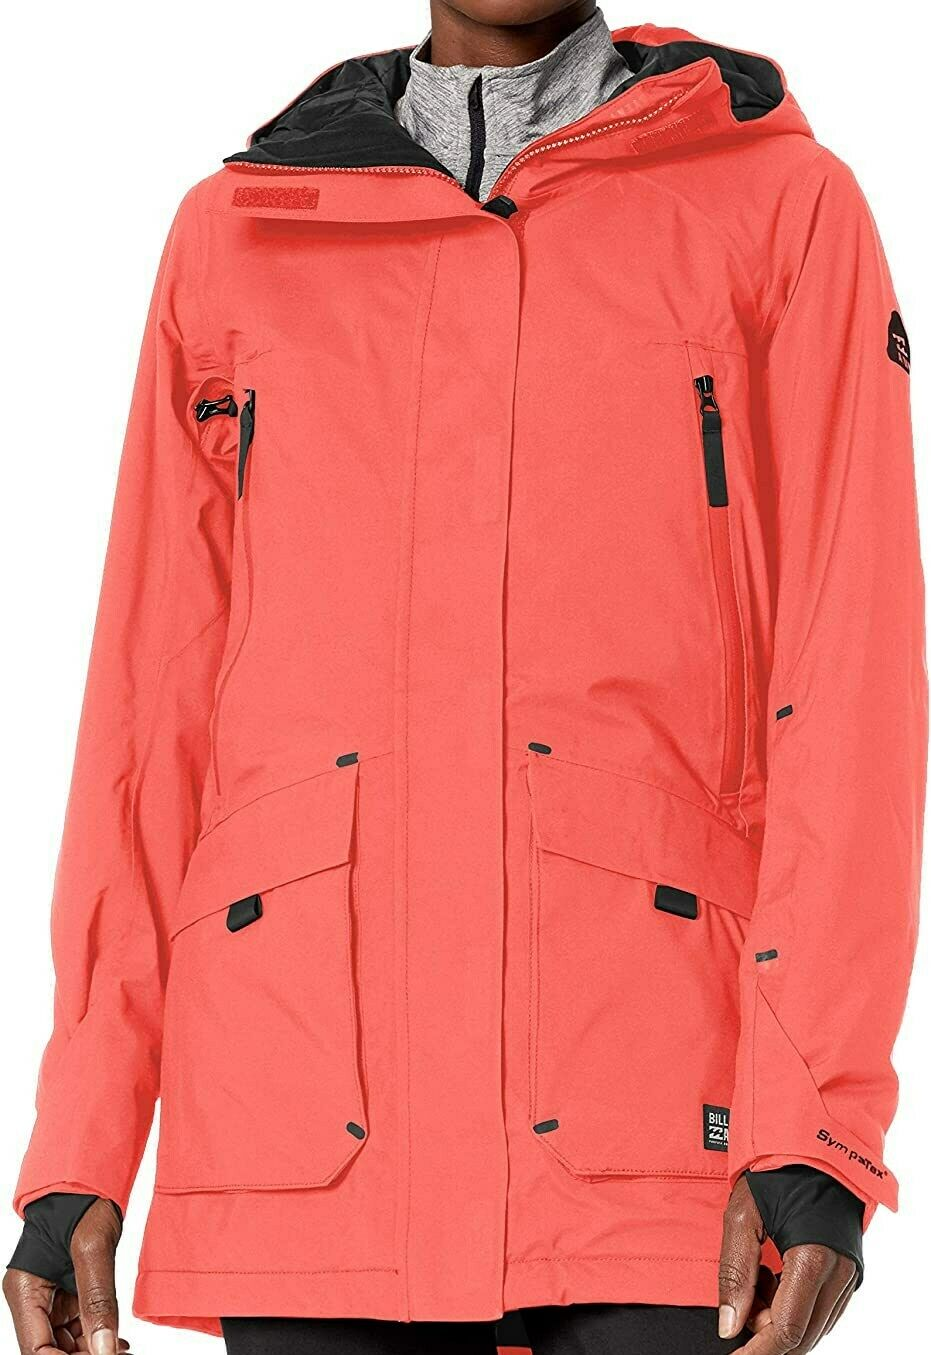 BILLABONG Women's TROOPER STX Snow 2020 Jacket - SRD - Medium - NWT